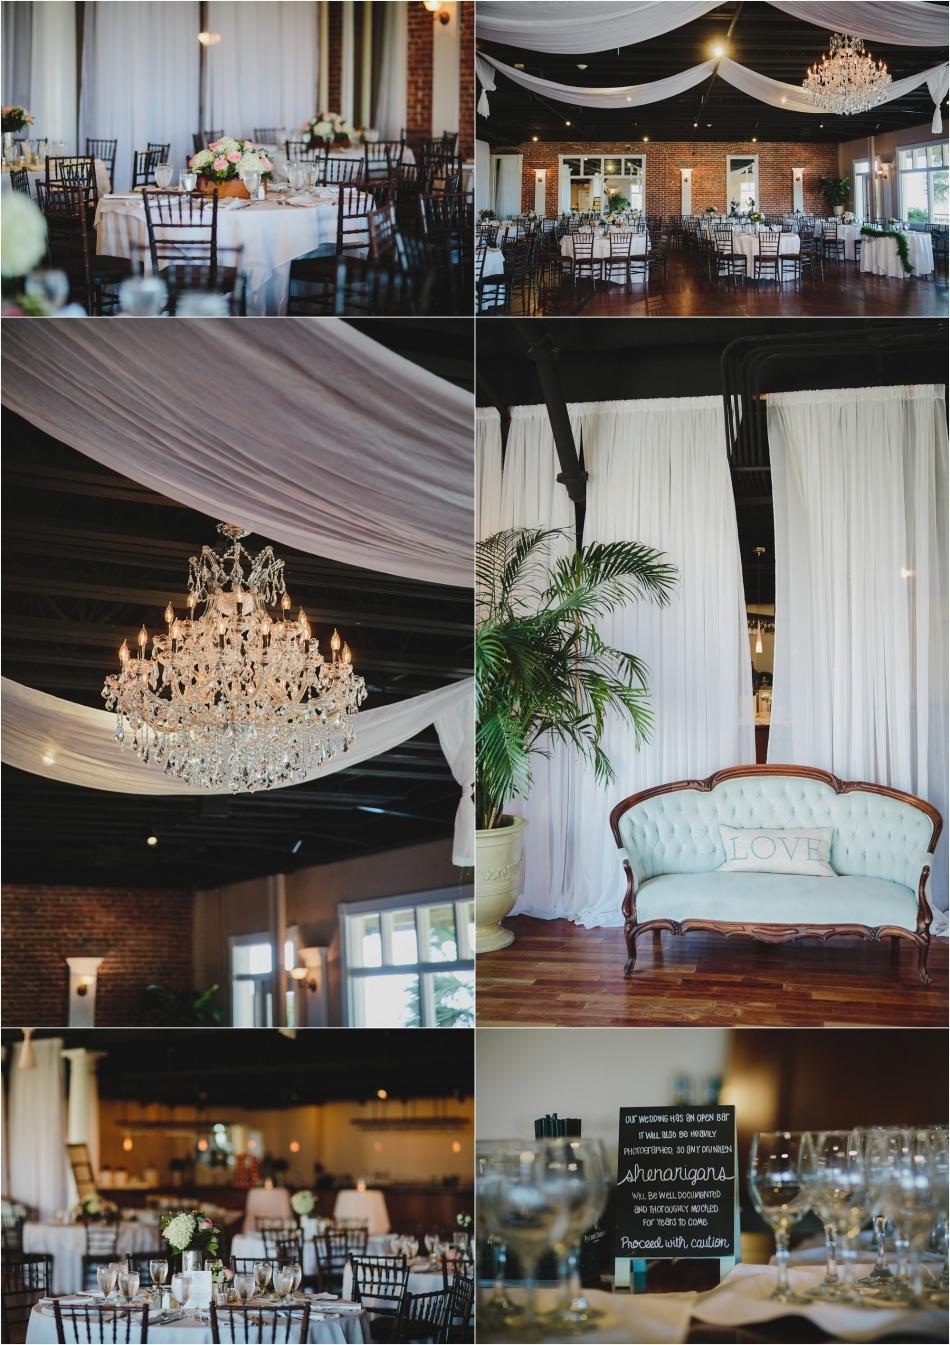 Villa-Blanca-White-Room-LP-0093.jpg